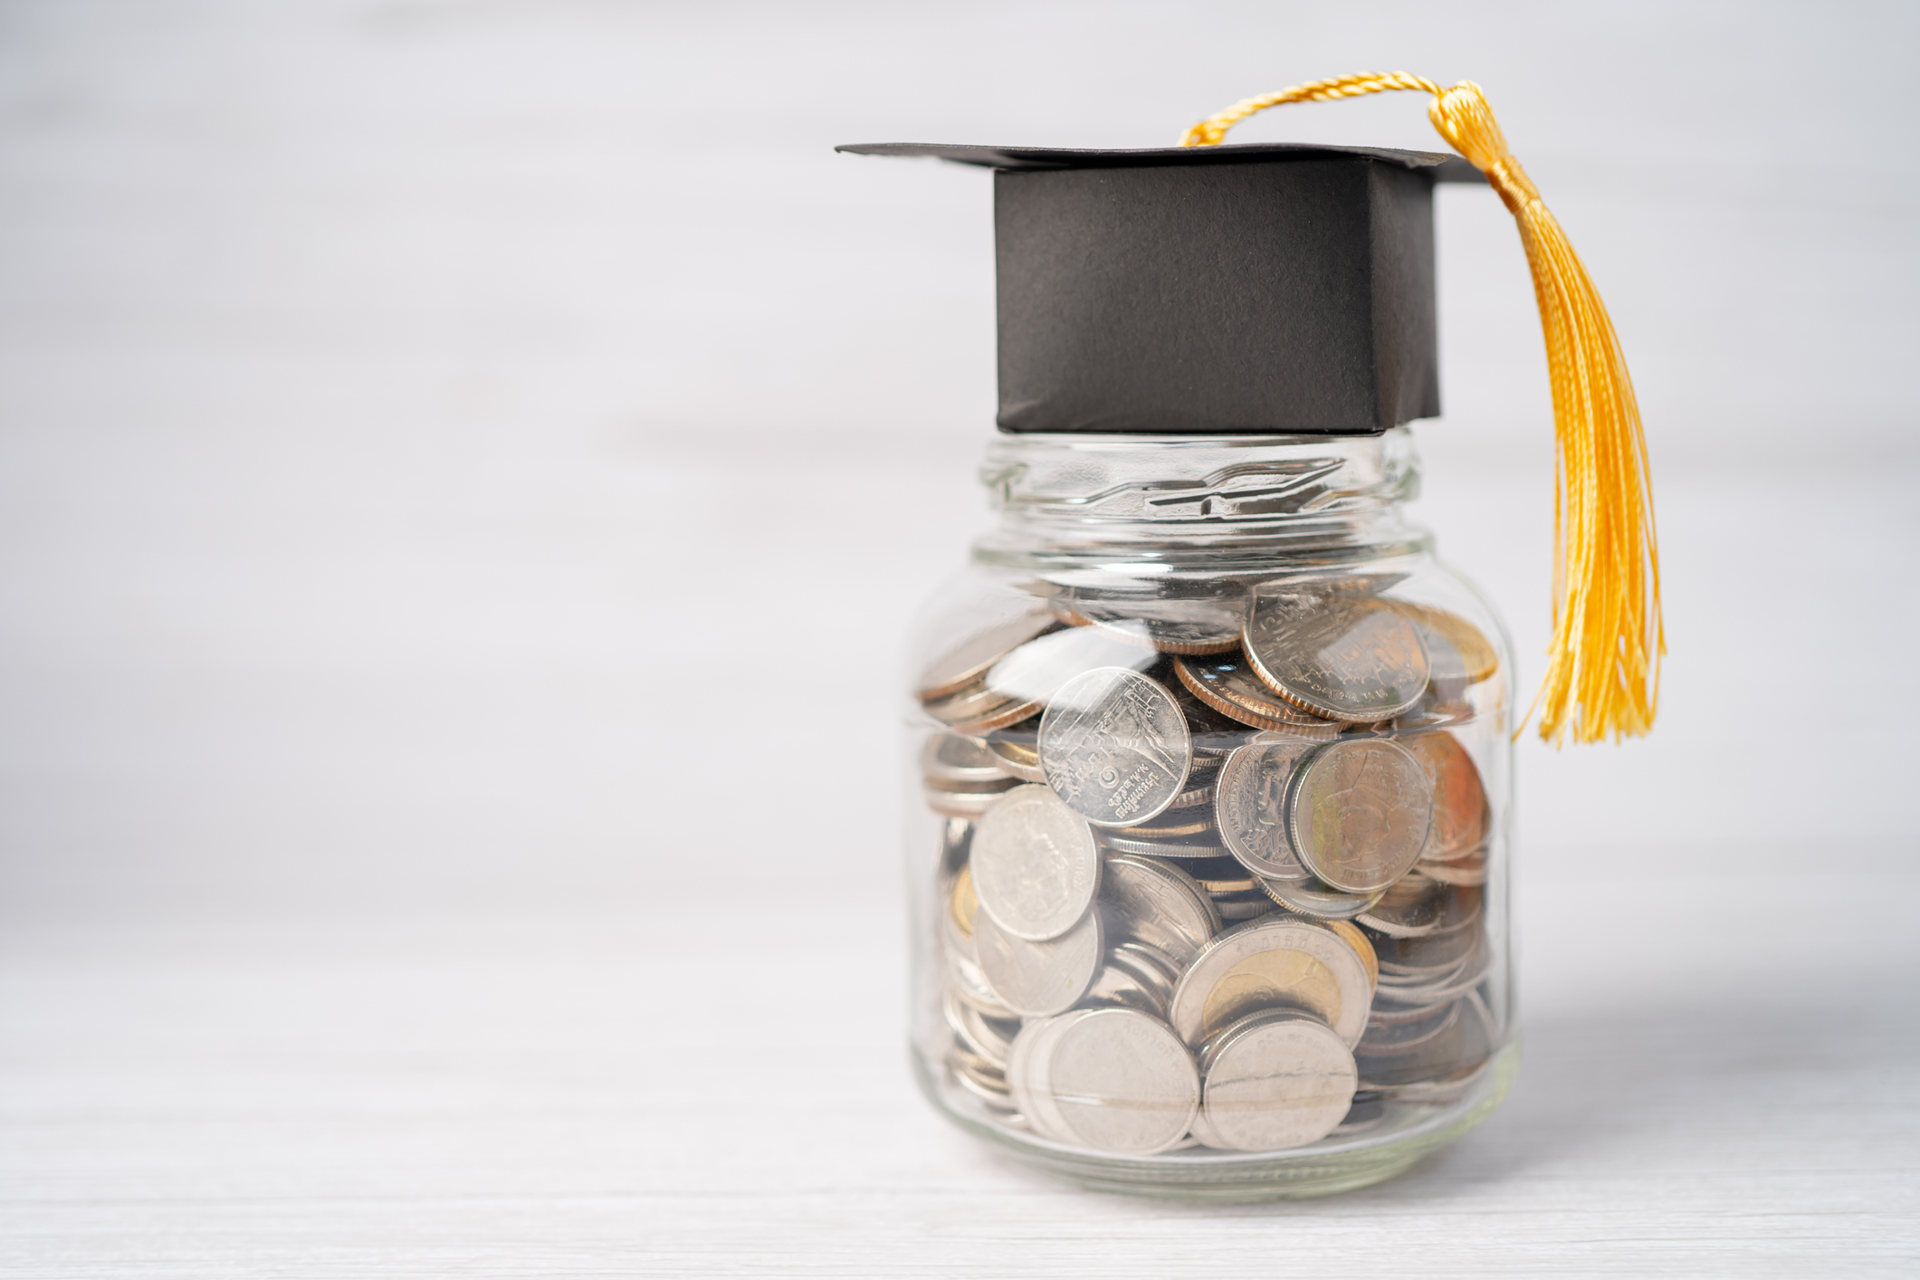 A graduation cap sitting on a jar of quarters.